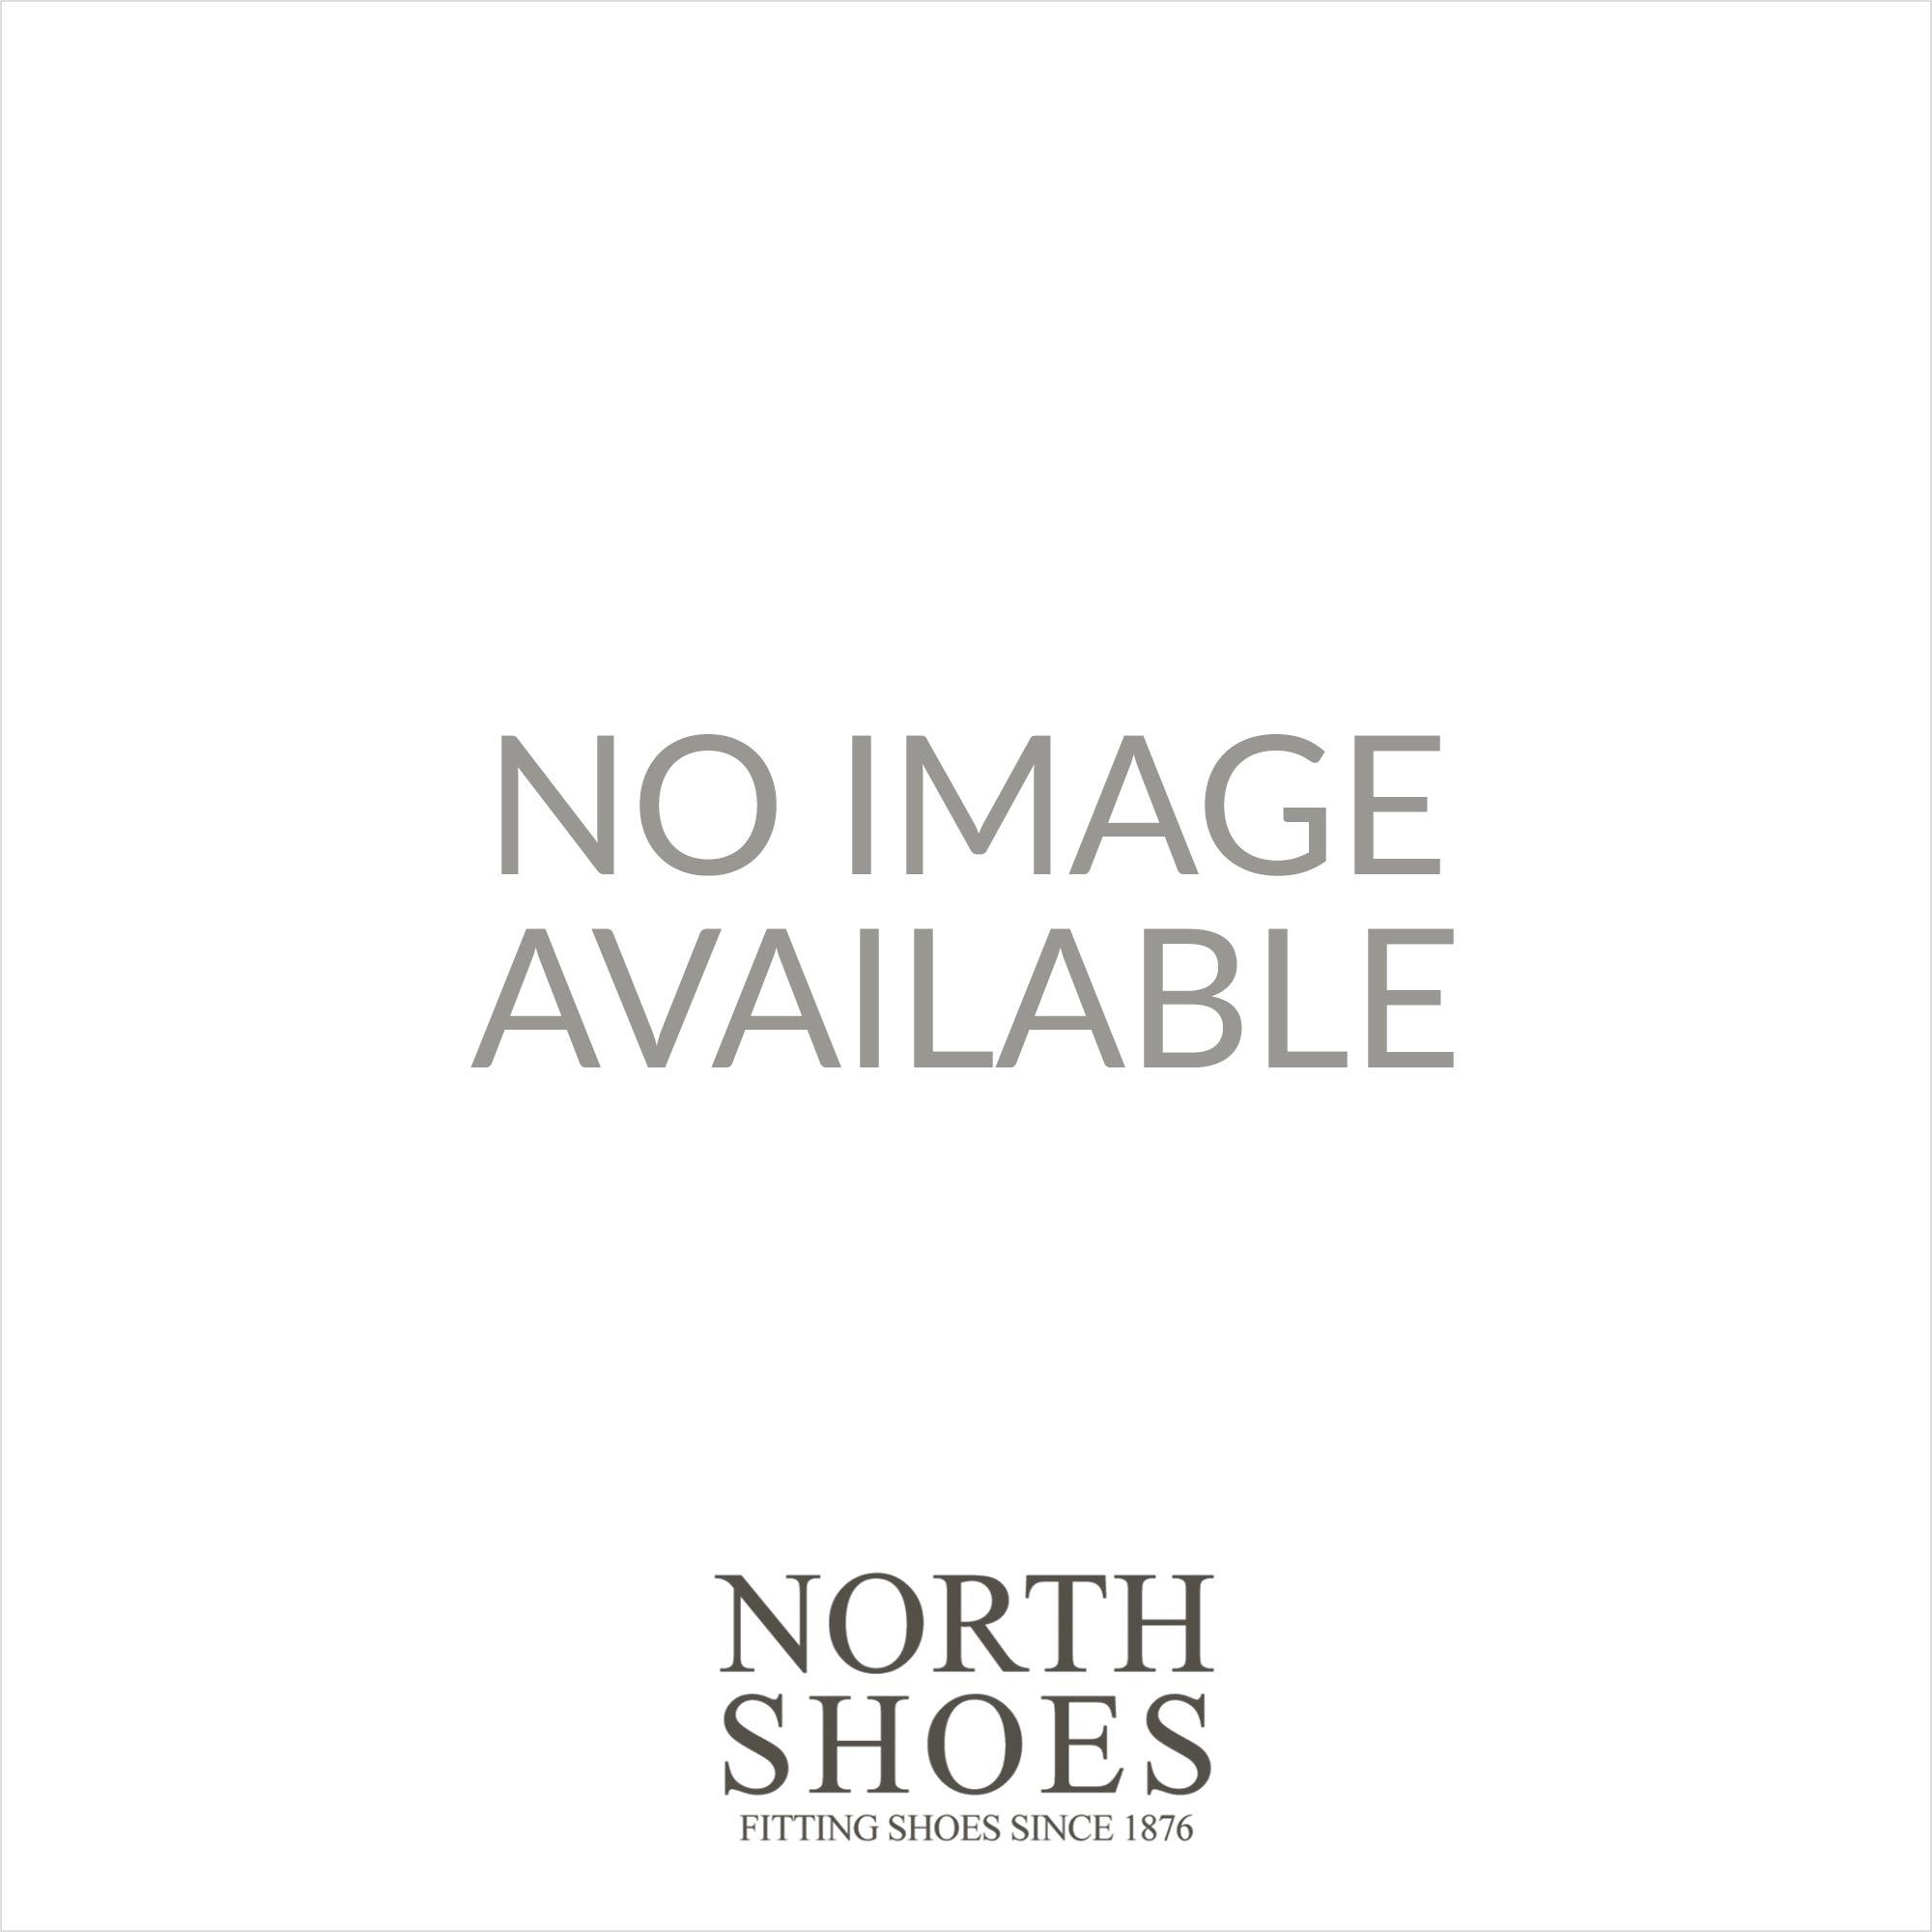 3f692ea964 Clarks Keesha Rosa Aubergine Womens Shoe - Clarks from North Shoes UK